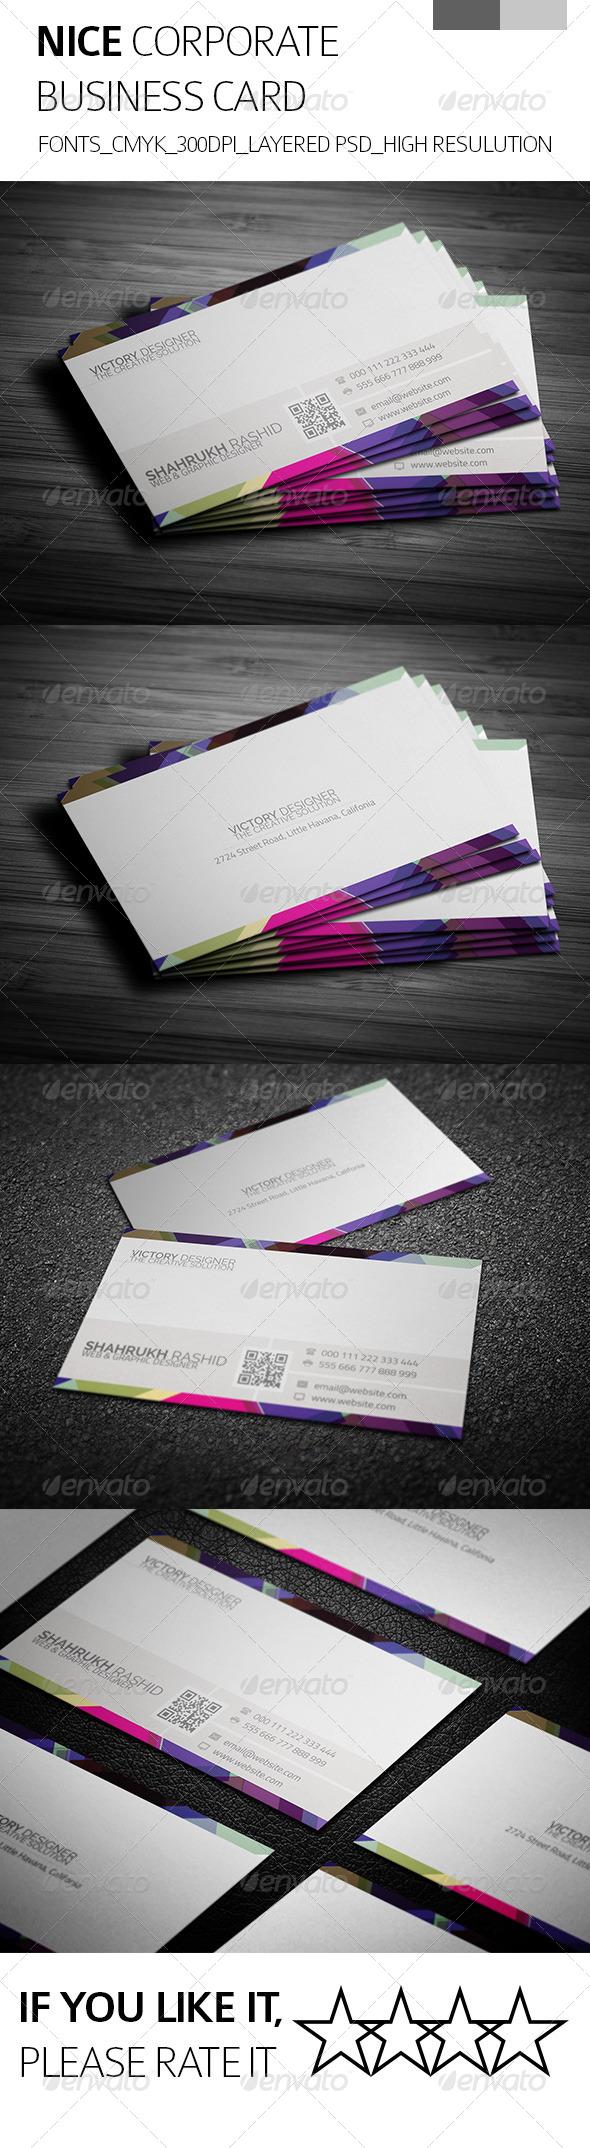 Nice & Corporate Business Card - Corporate Business Cards